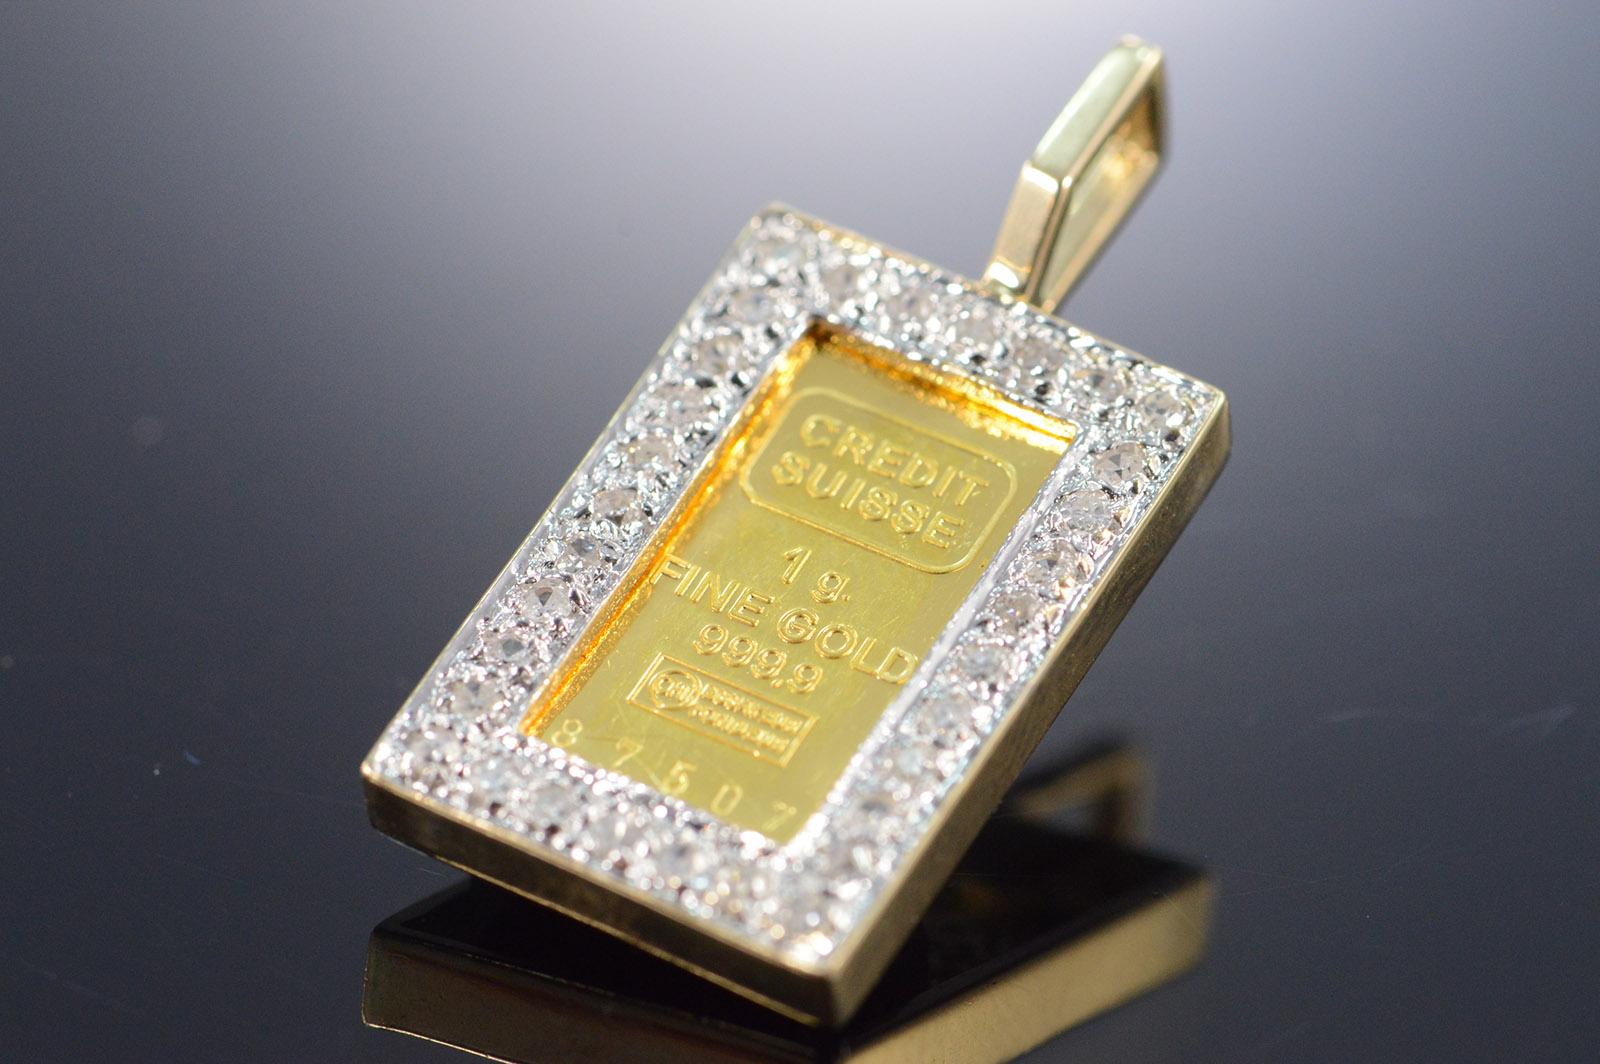 14k 33g 025 ctw diamond bezel 1 gram 999 gold bar yellow gold image 1 of 4 free shipping aloadofball Images